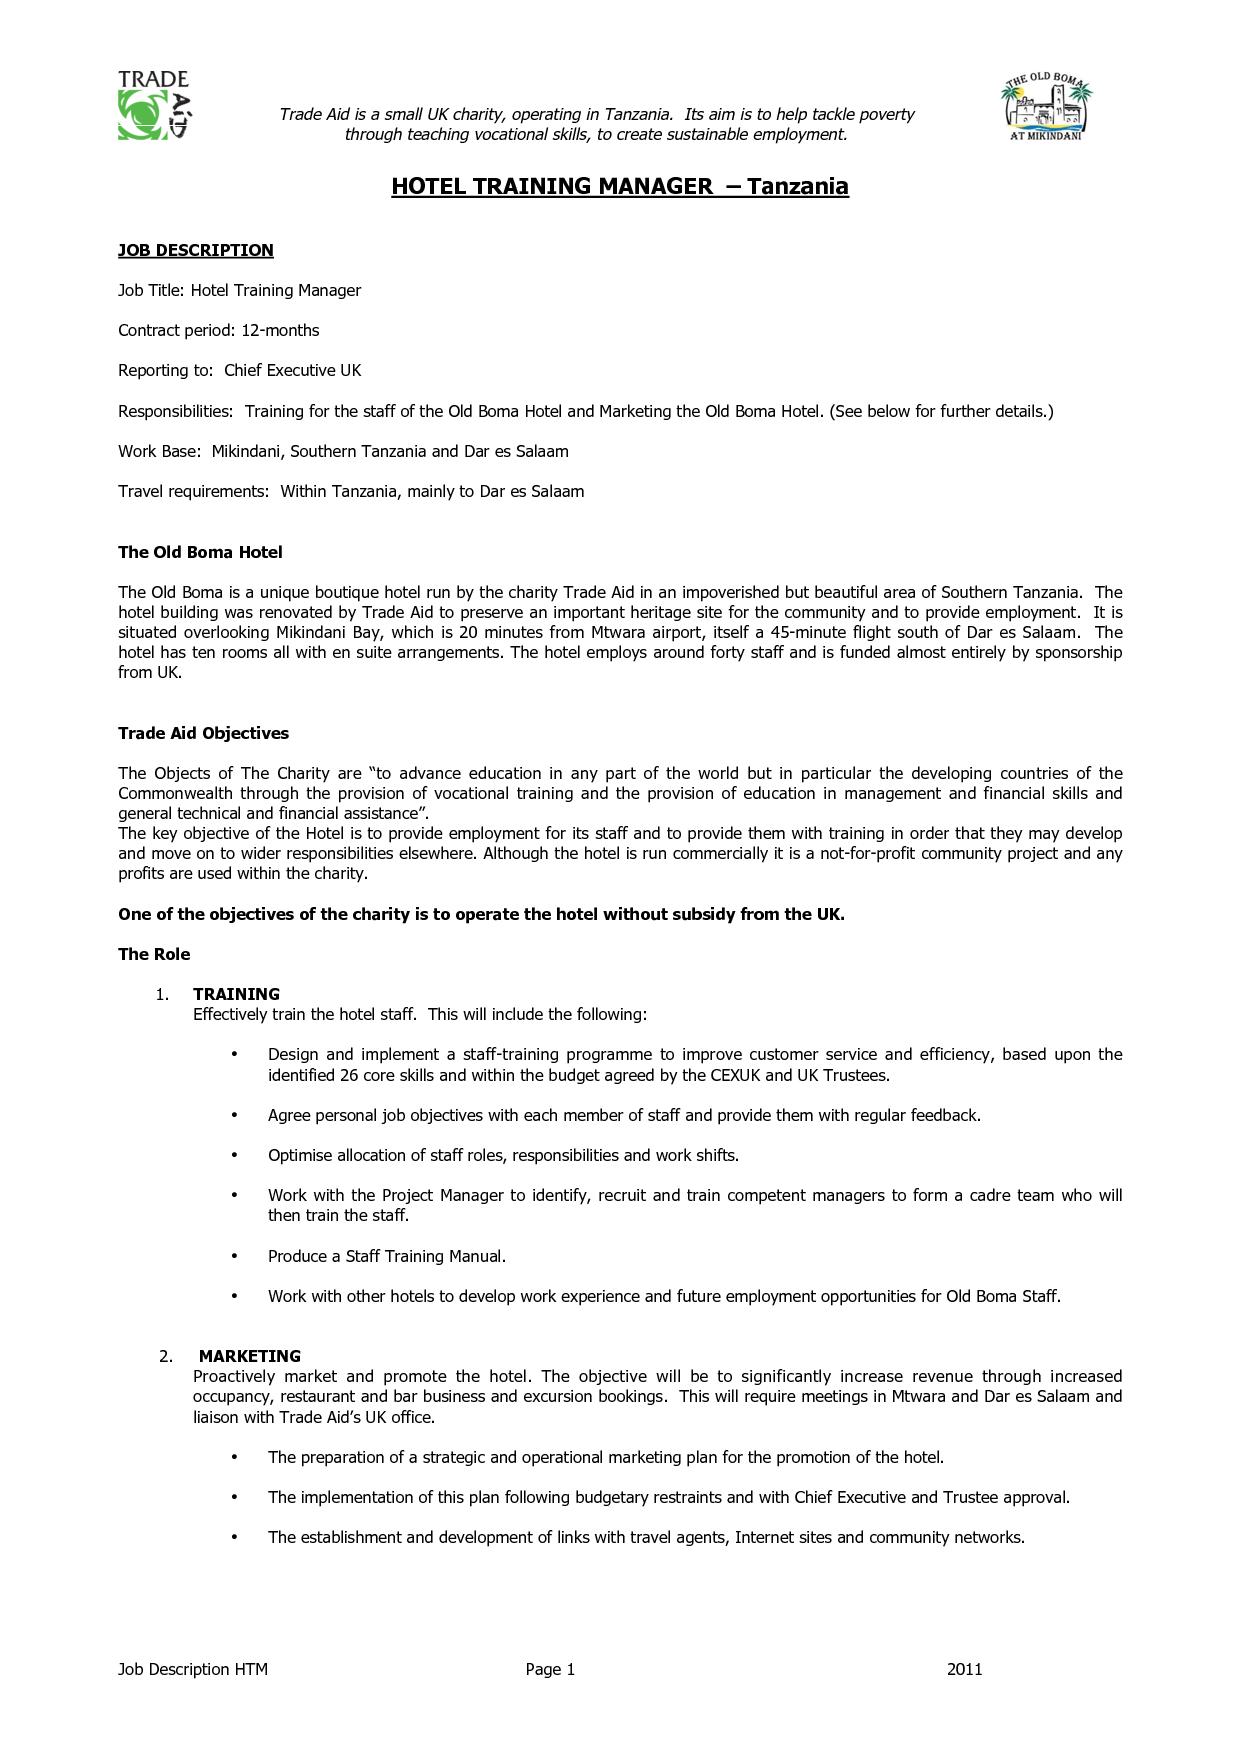 Personal Manager Job Description